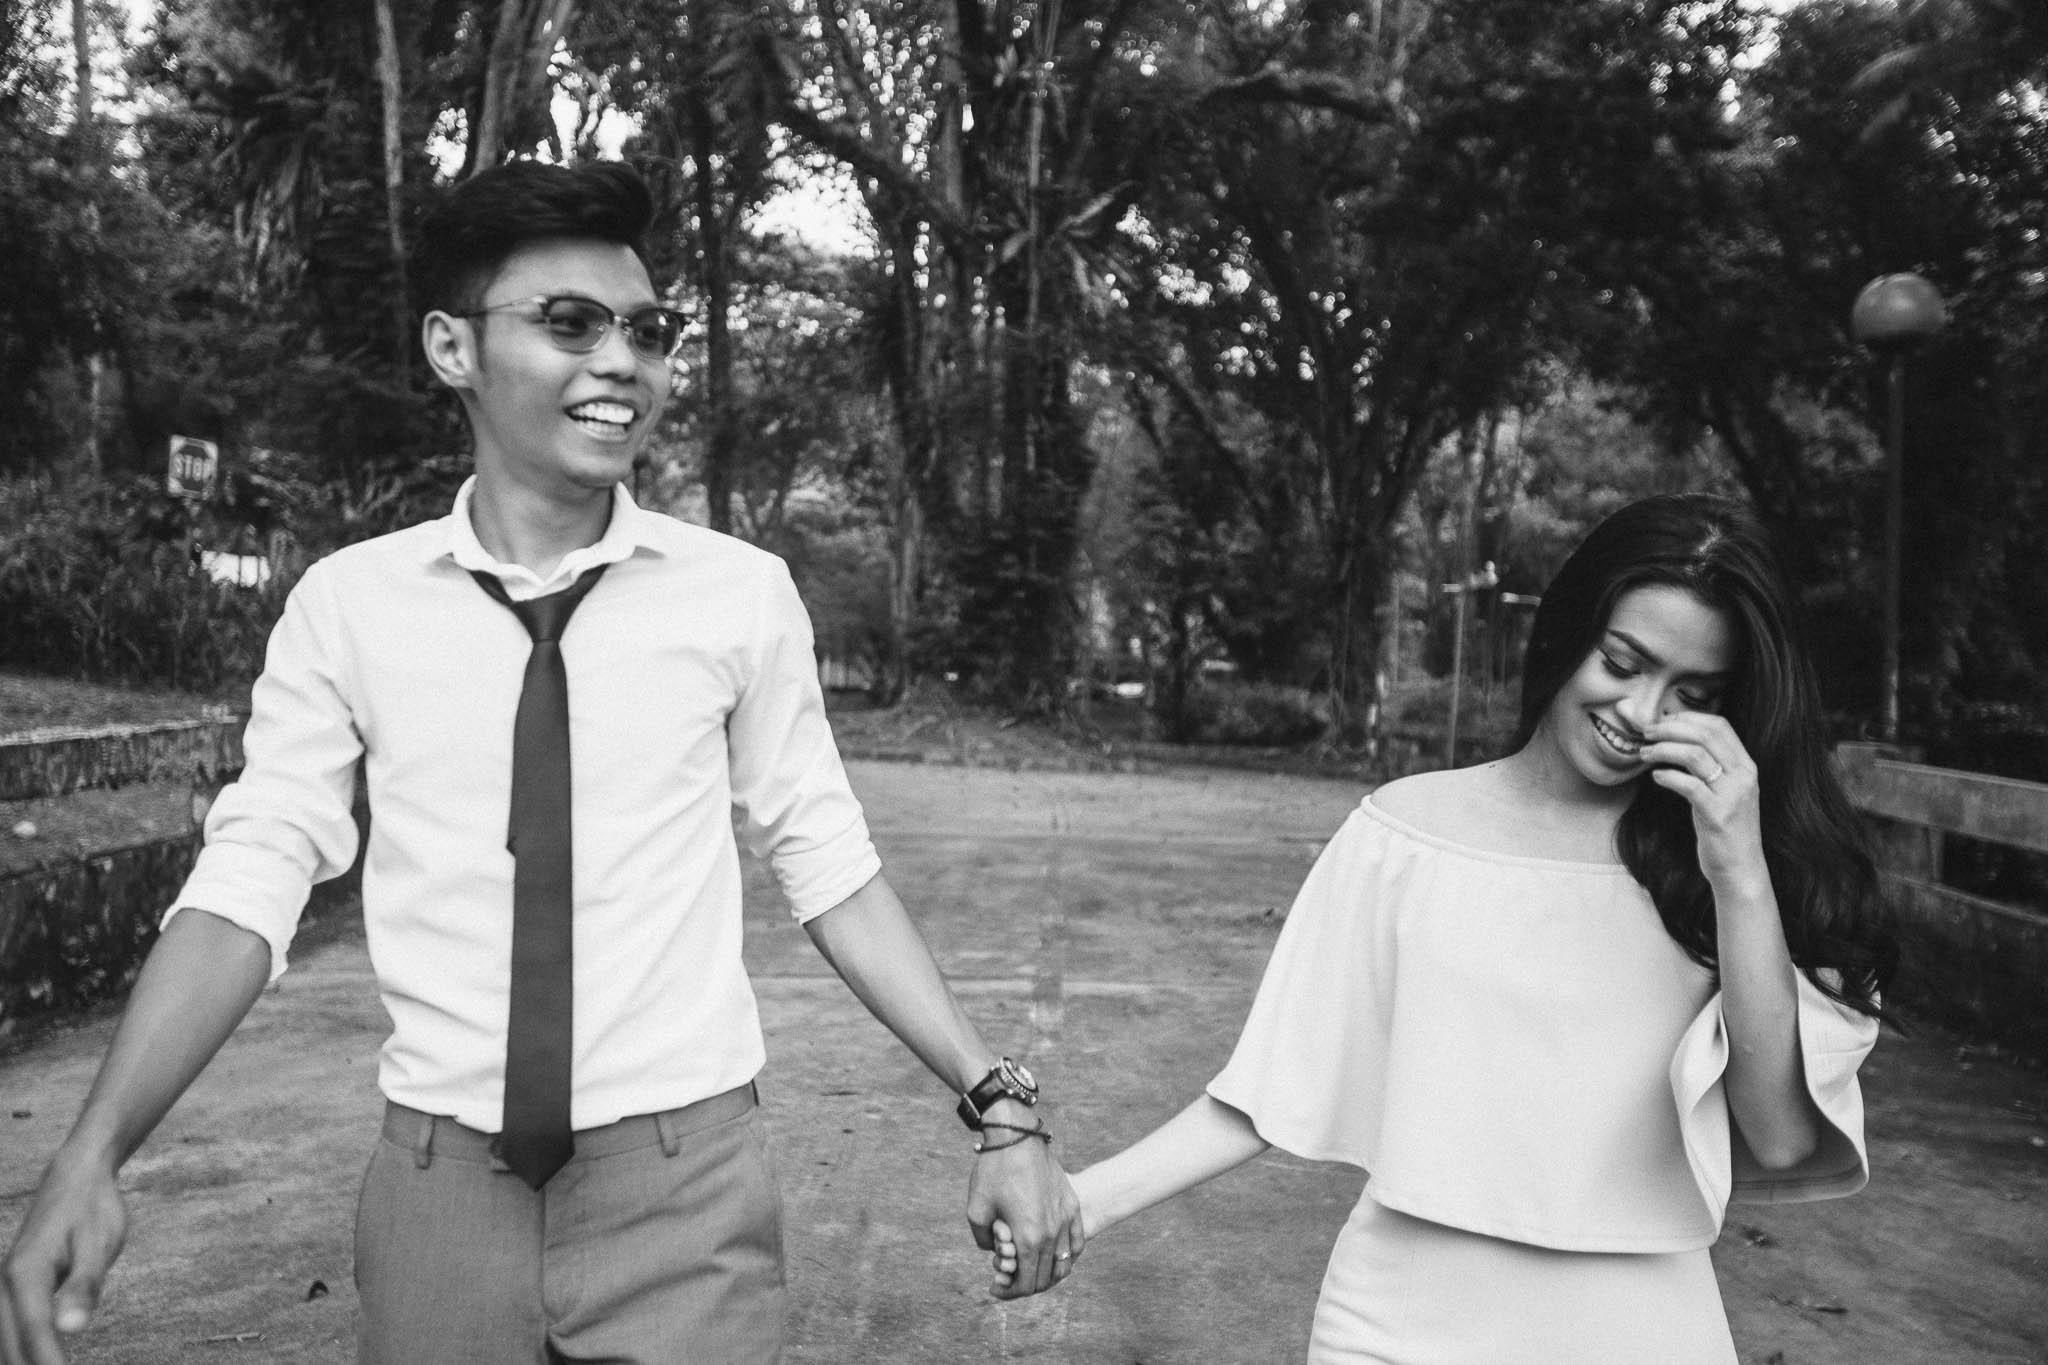 singapore-wedding-photographer-malay-travel-adli-tashah-13.jpg